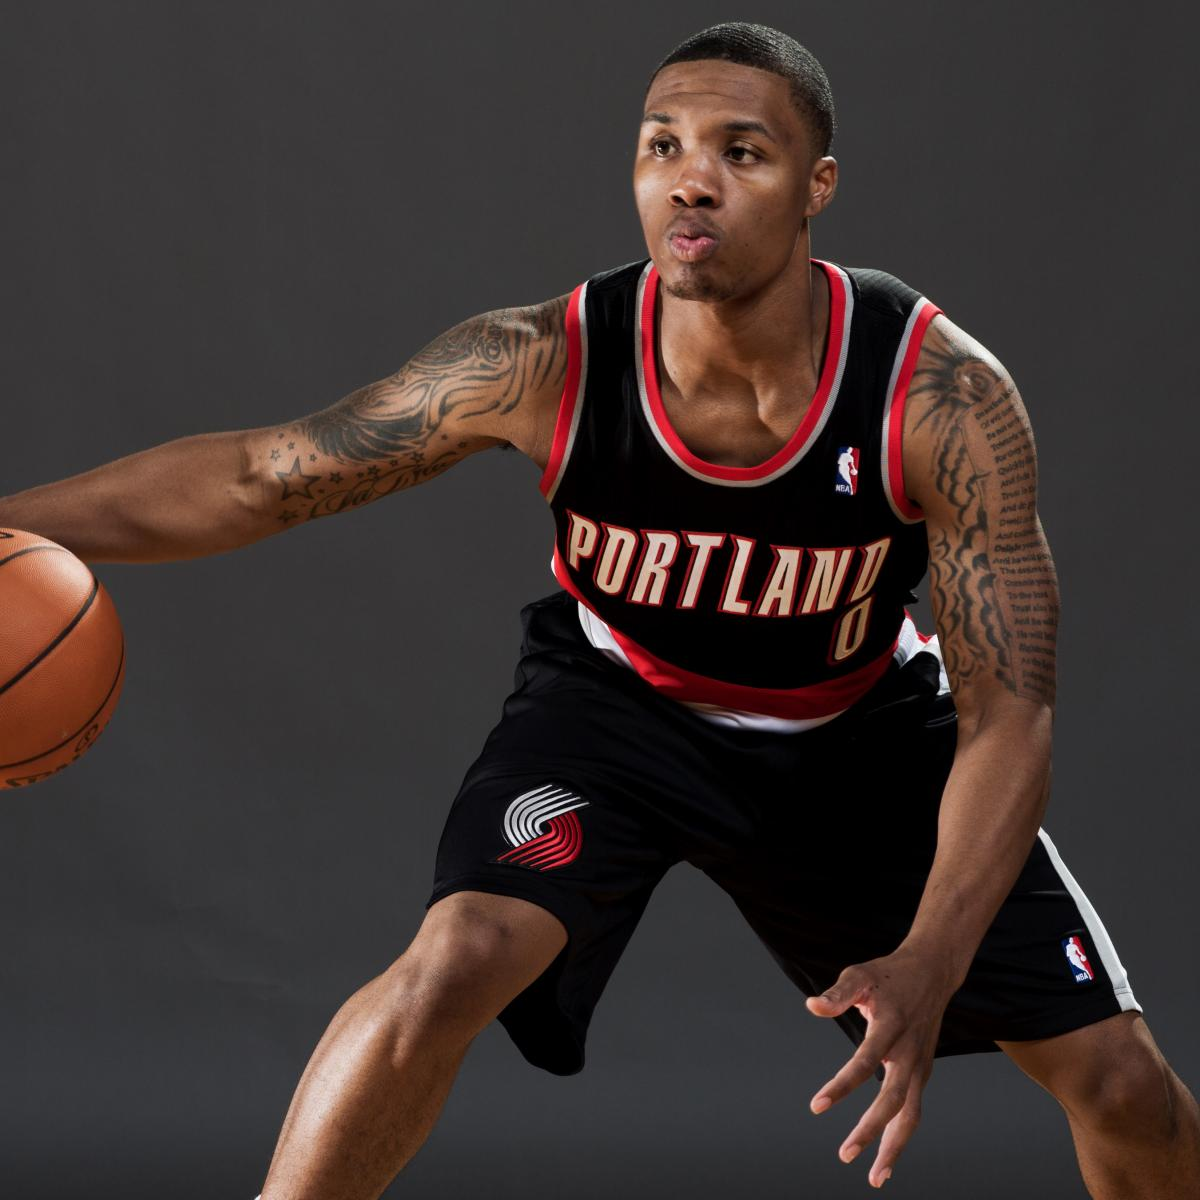 Portland Blazers Roster 2012: 4 Reasons Damian Lillard Will Eventually Make Trail